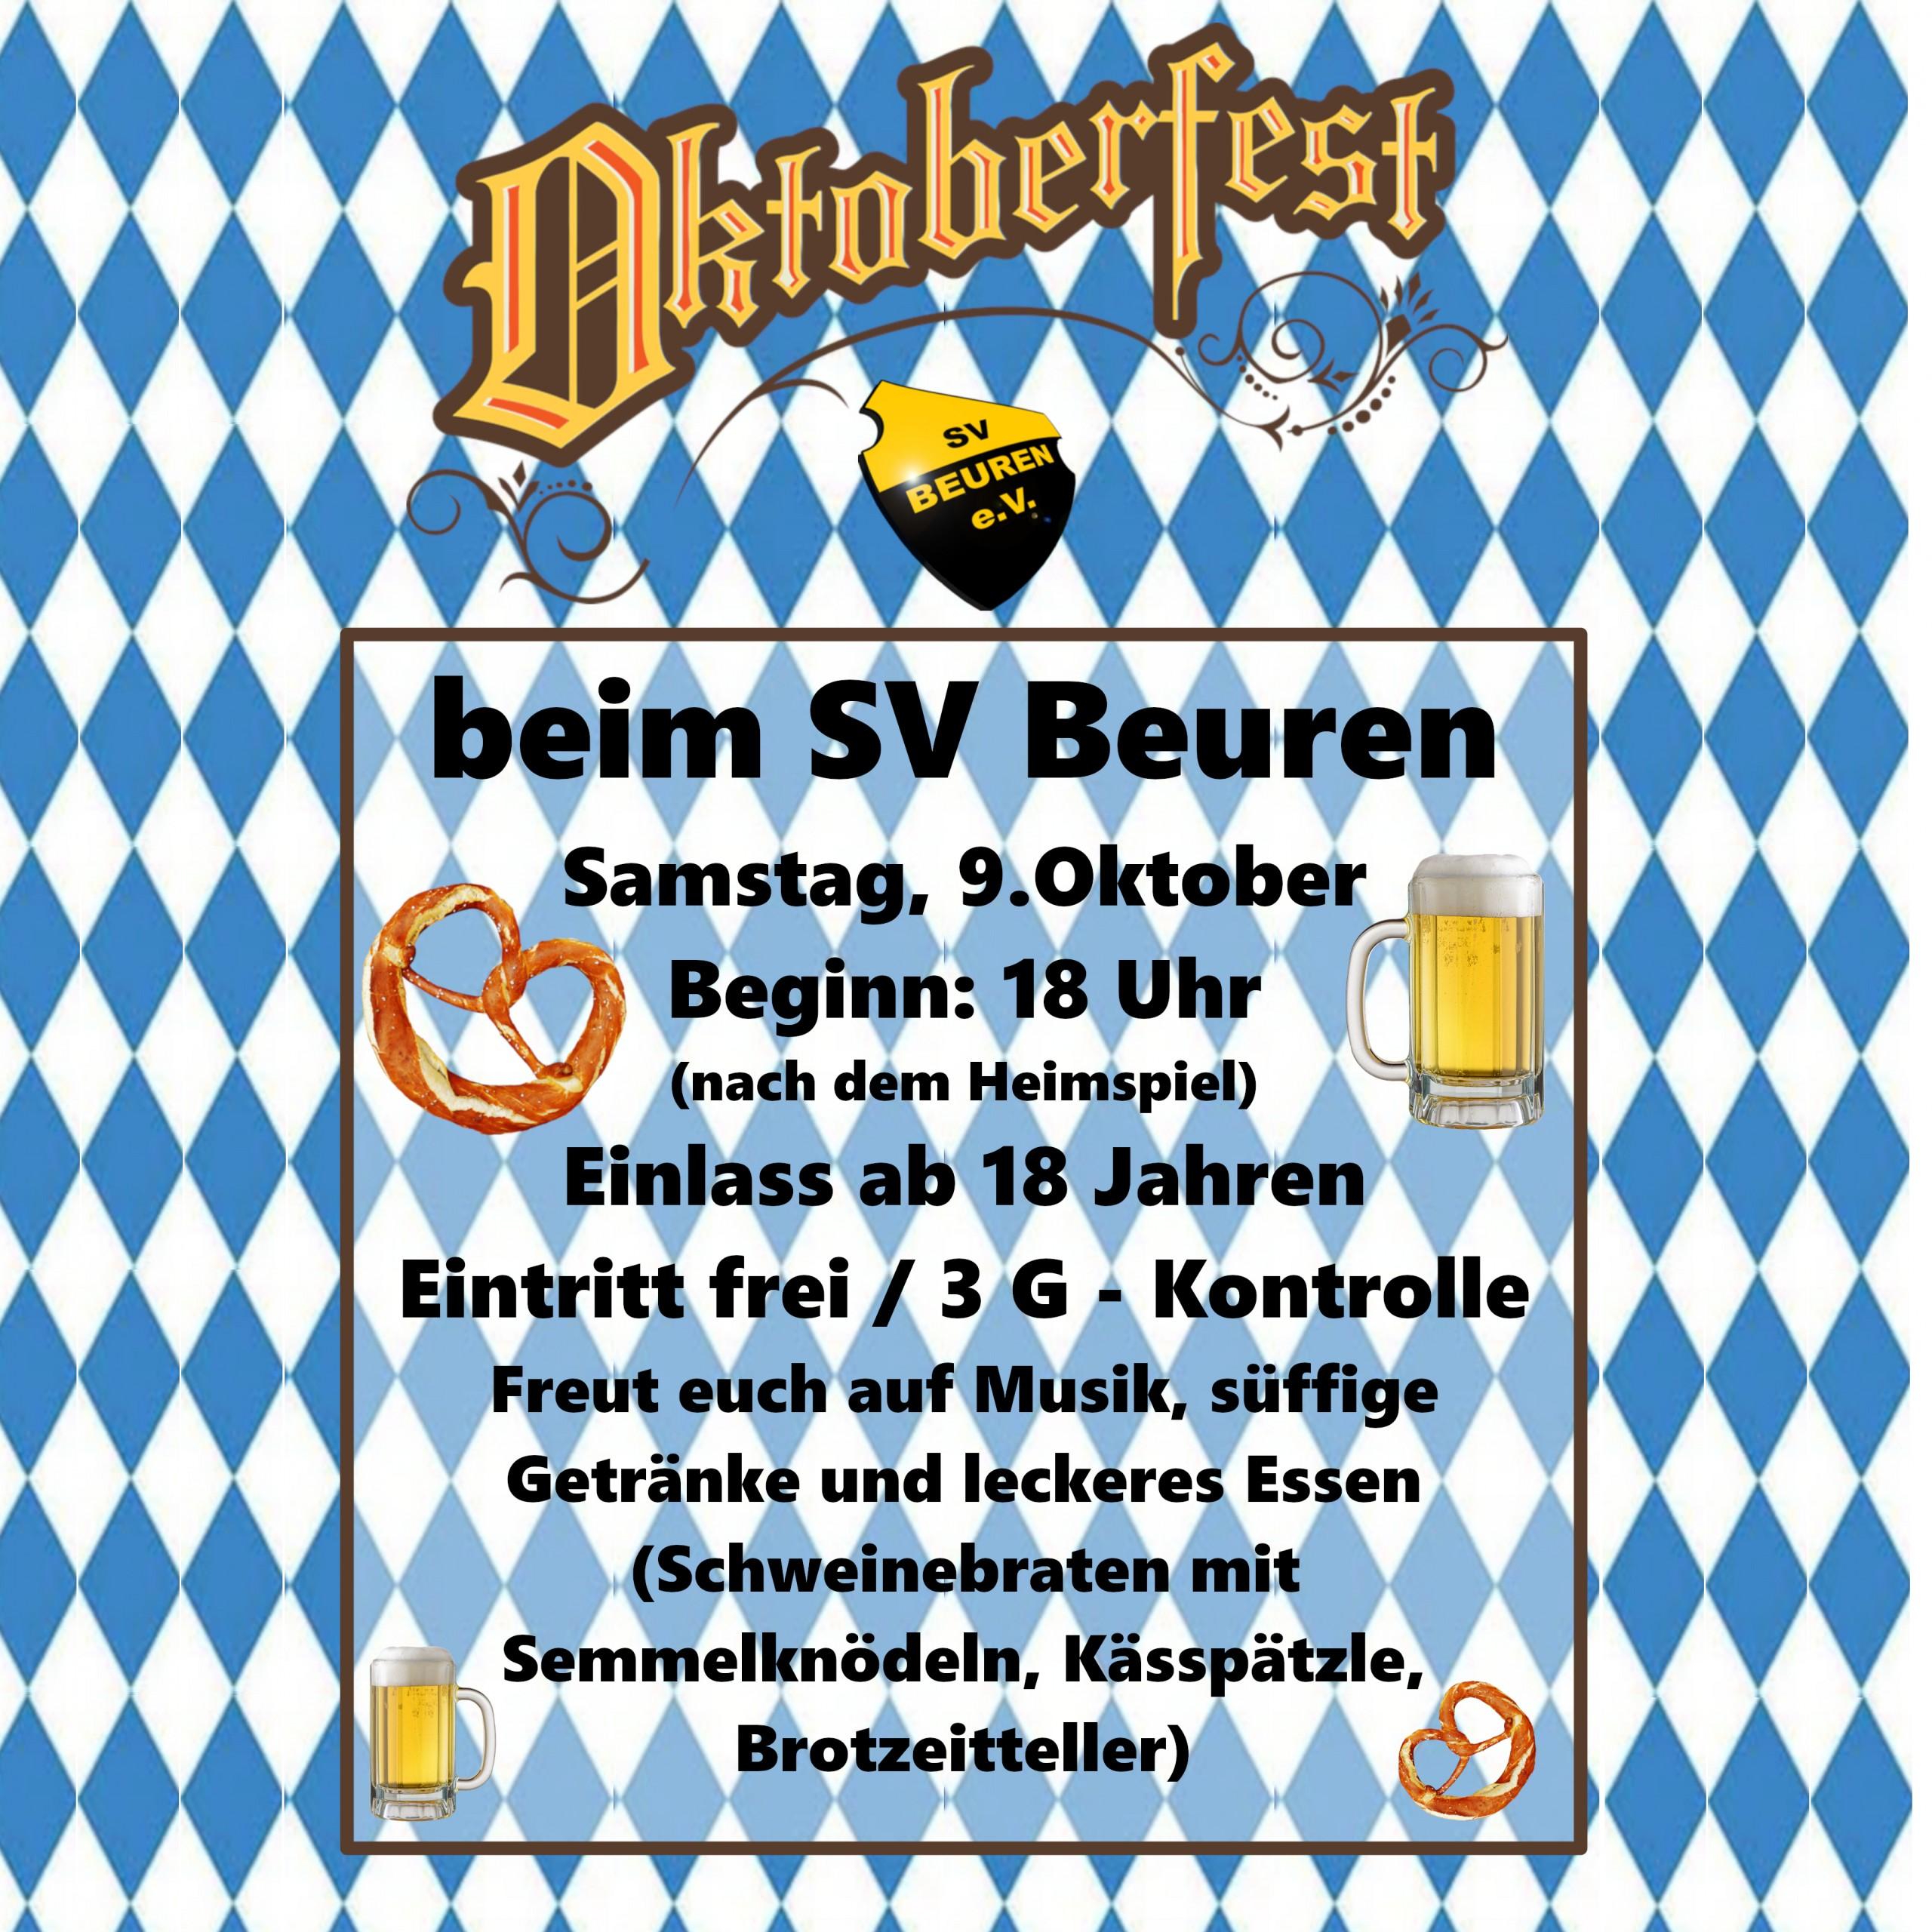 Oktoberfest am 09.10.2021